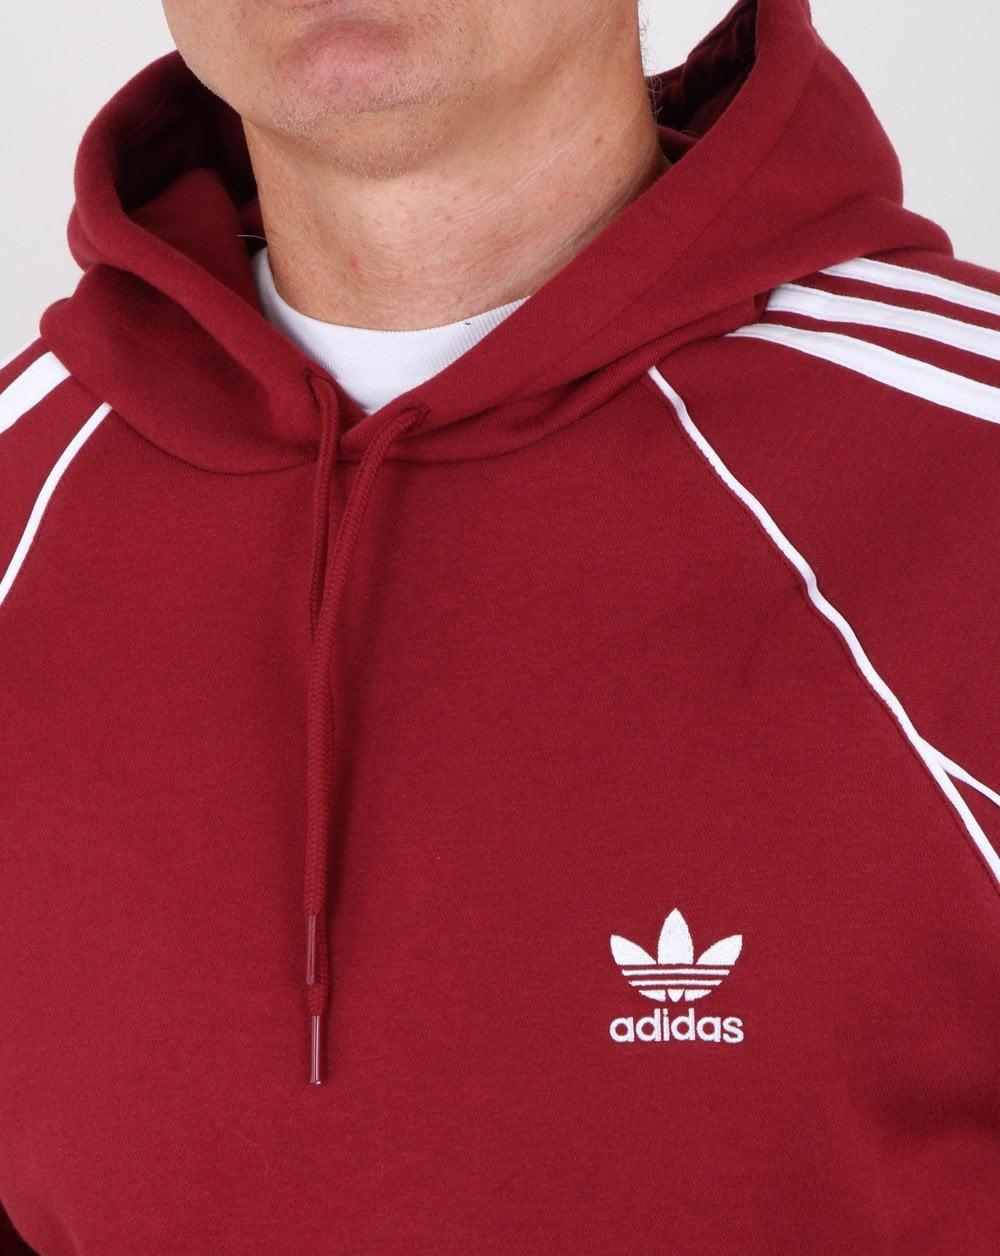 Adidas Originals Authentics Hoody Maroon 4ef9bc80235